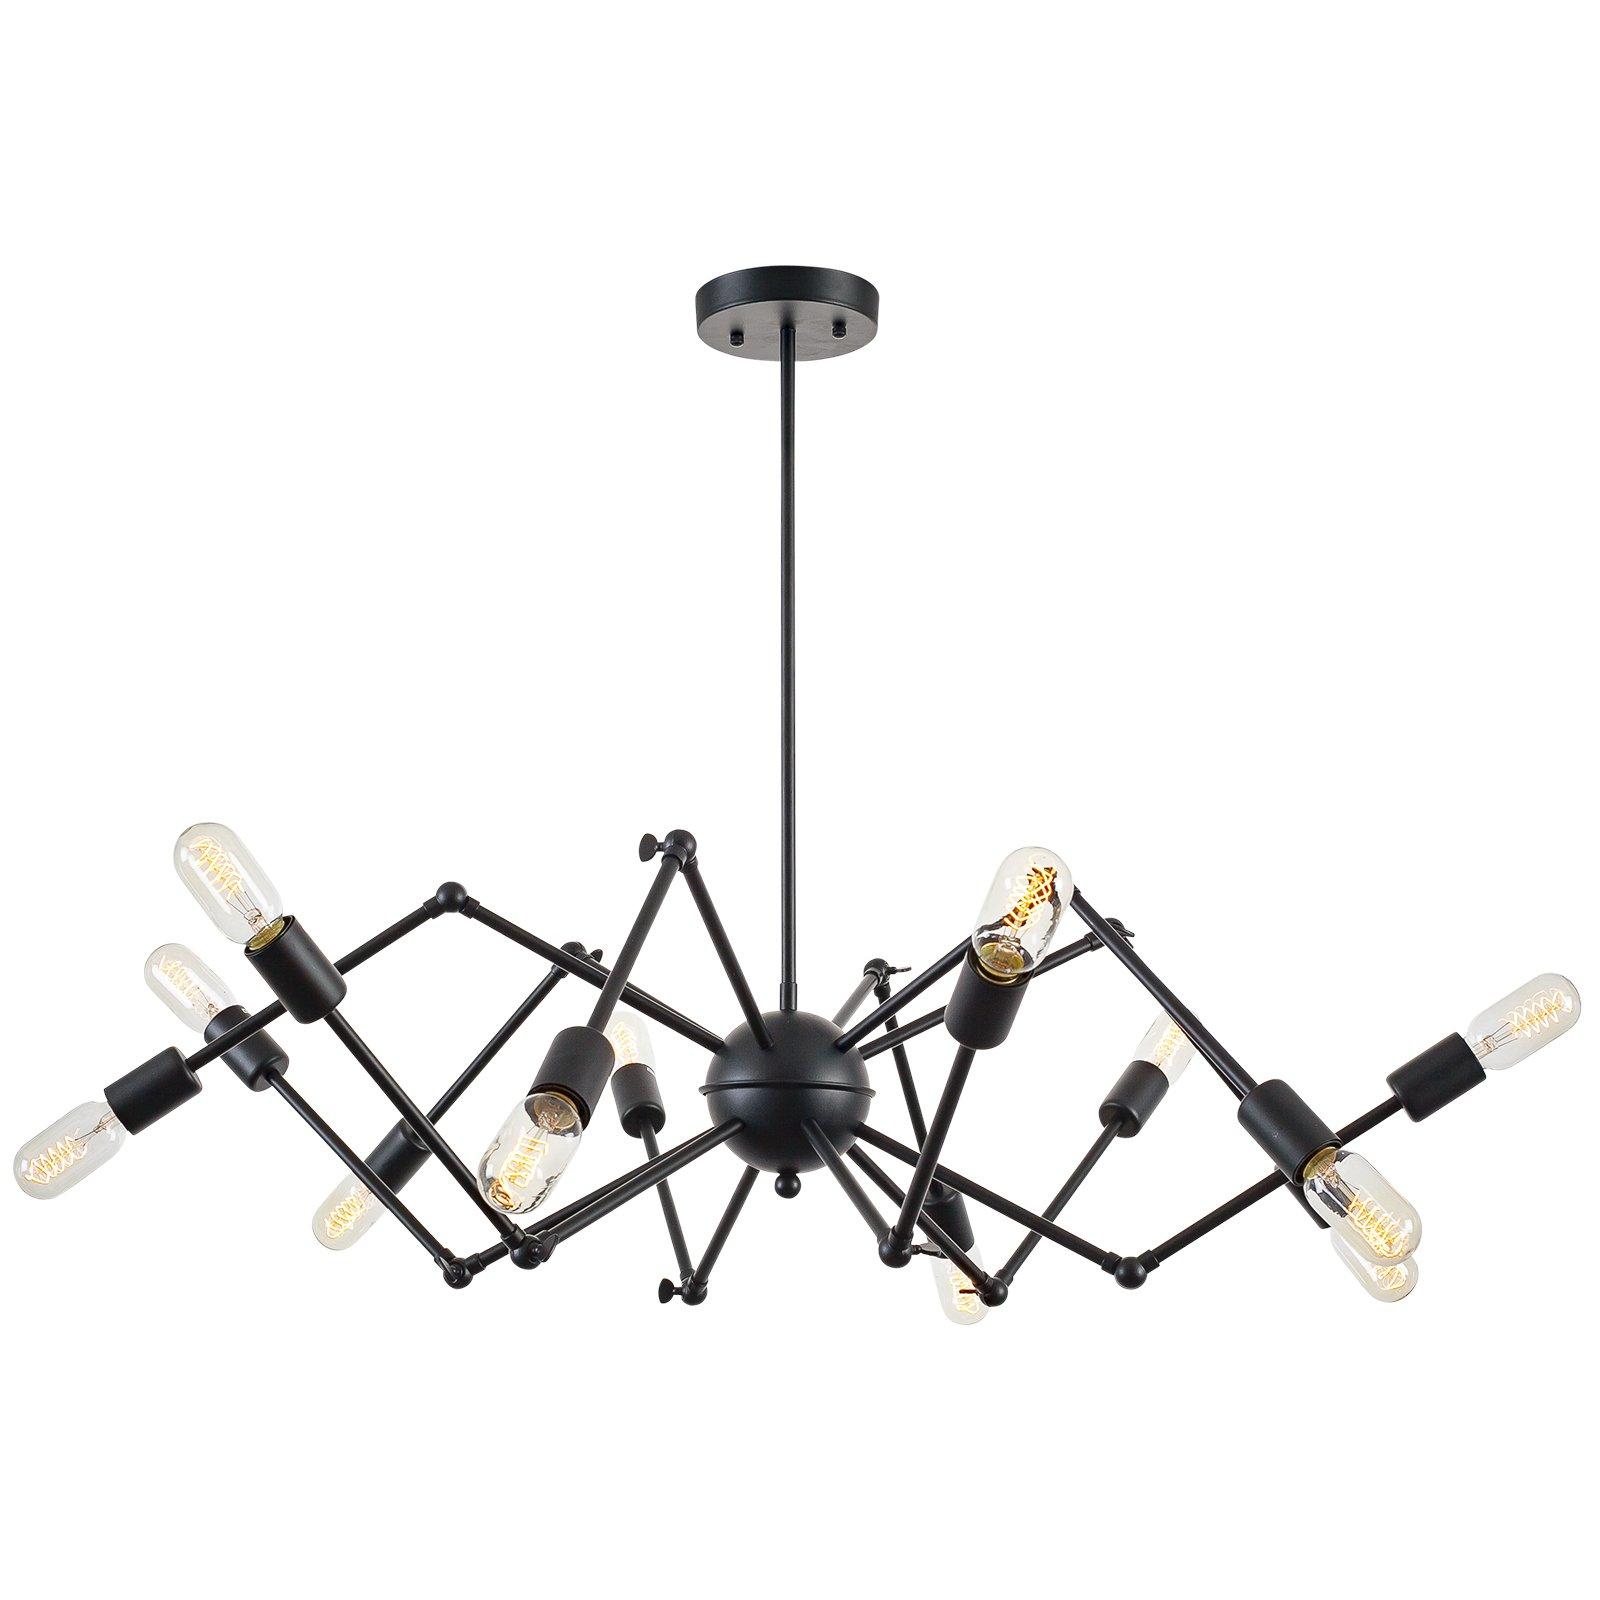 Light Society Arachnid 12-Light Chandelier Pendant, Matte Black, Mid Century Modern Industrial Starburst-Style Lighting Fixture (LS-C111-BLK)